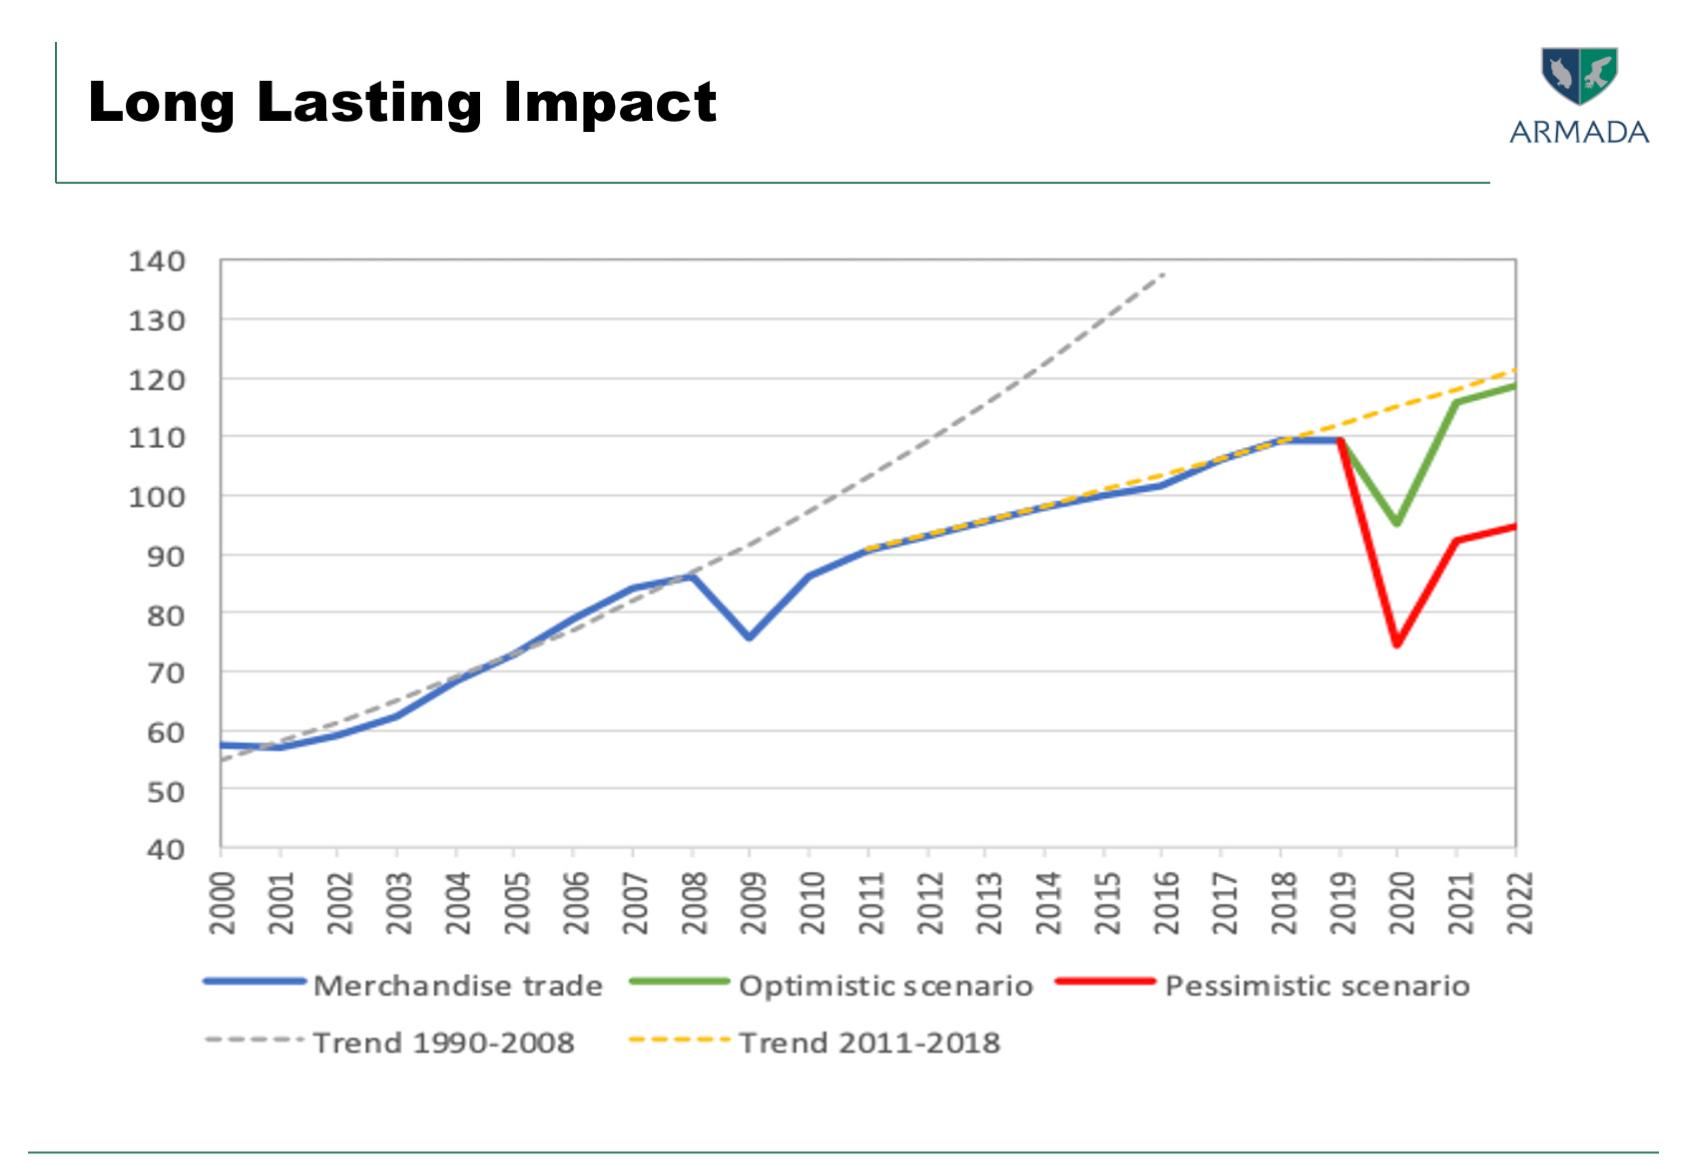 chart - Long lasting impact